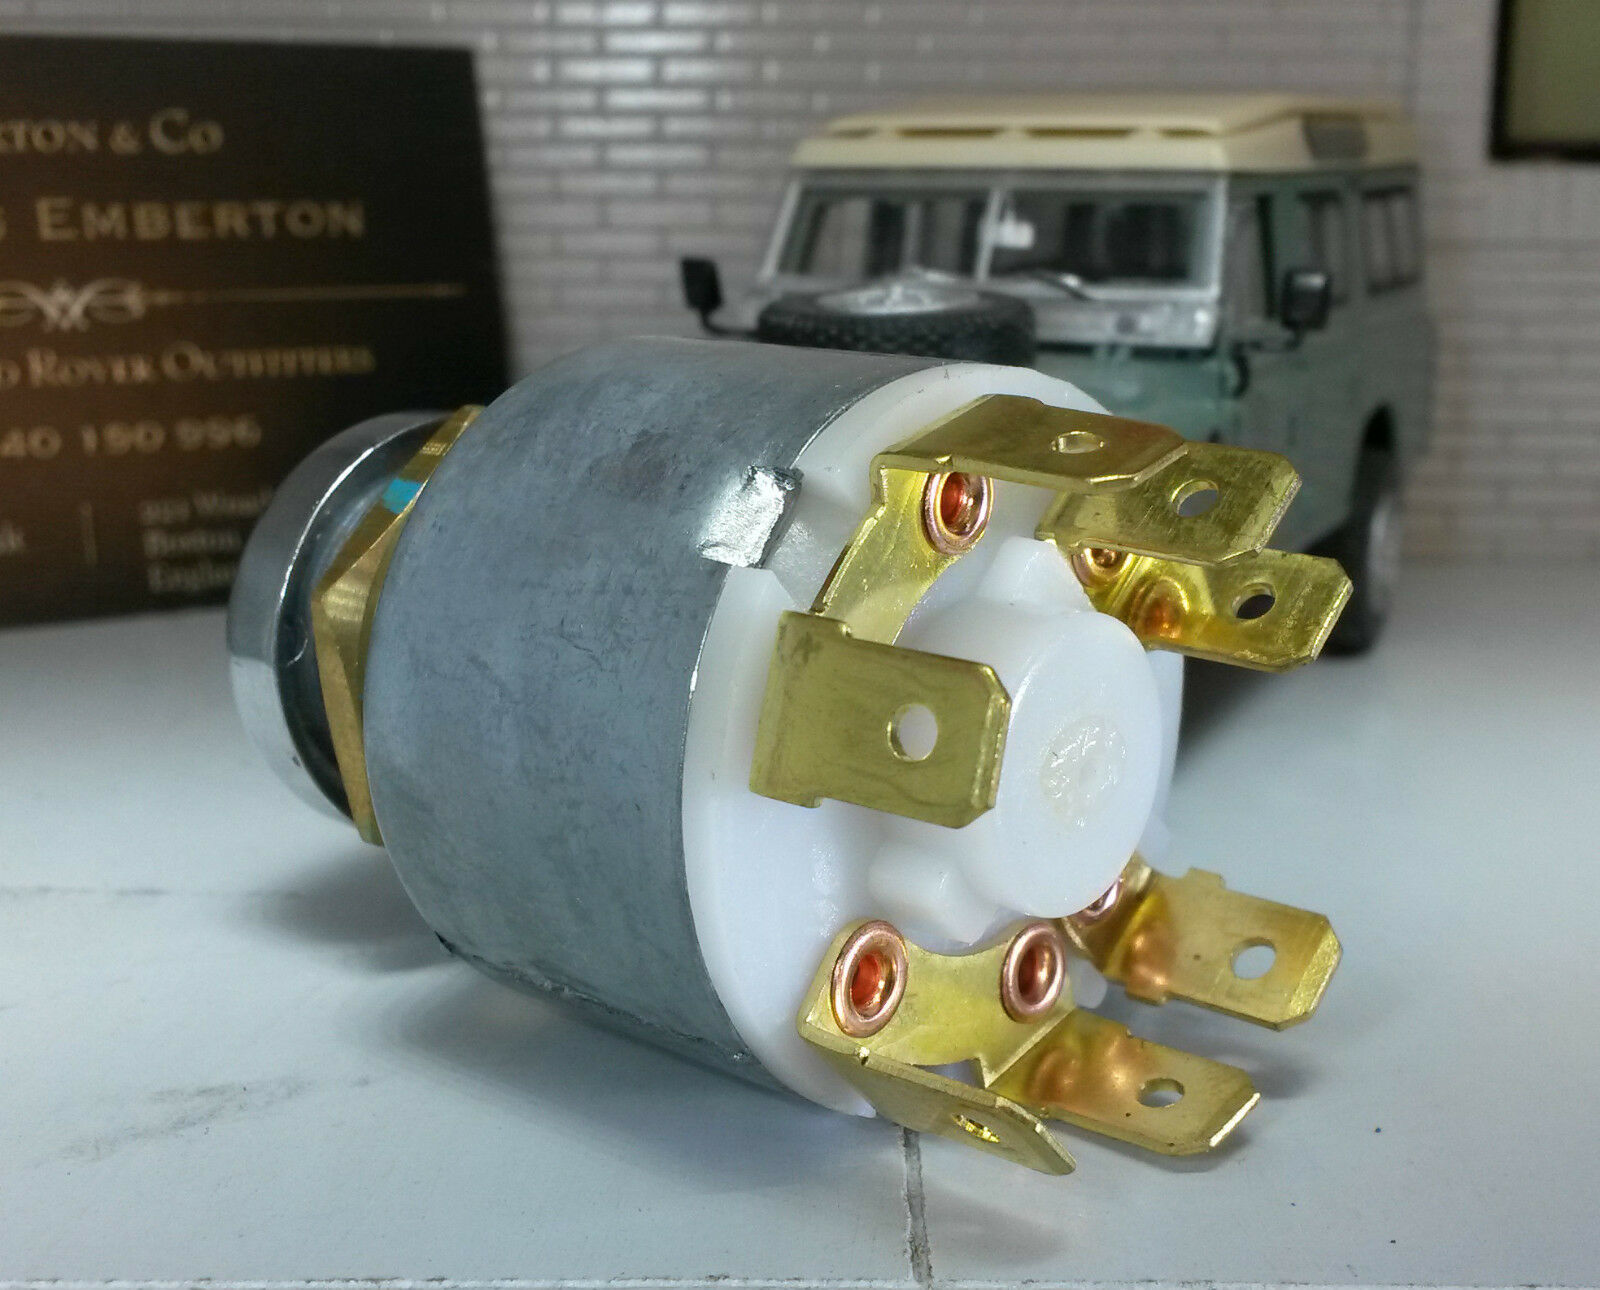 Gen Lucas Essence Allumage Interrupteur /& Clé 551508 Land Rover Série 2 3 Léger